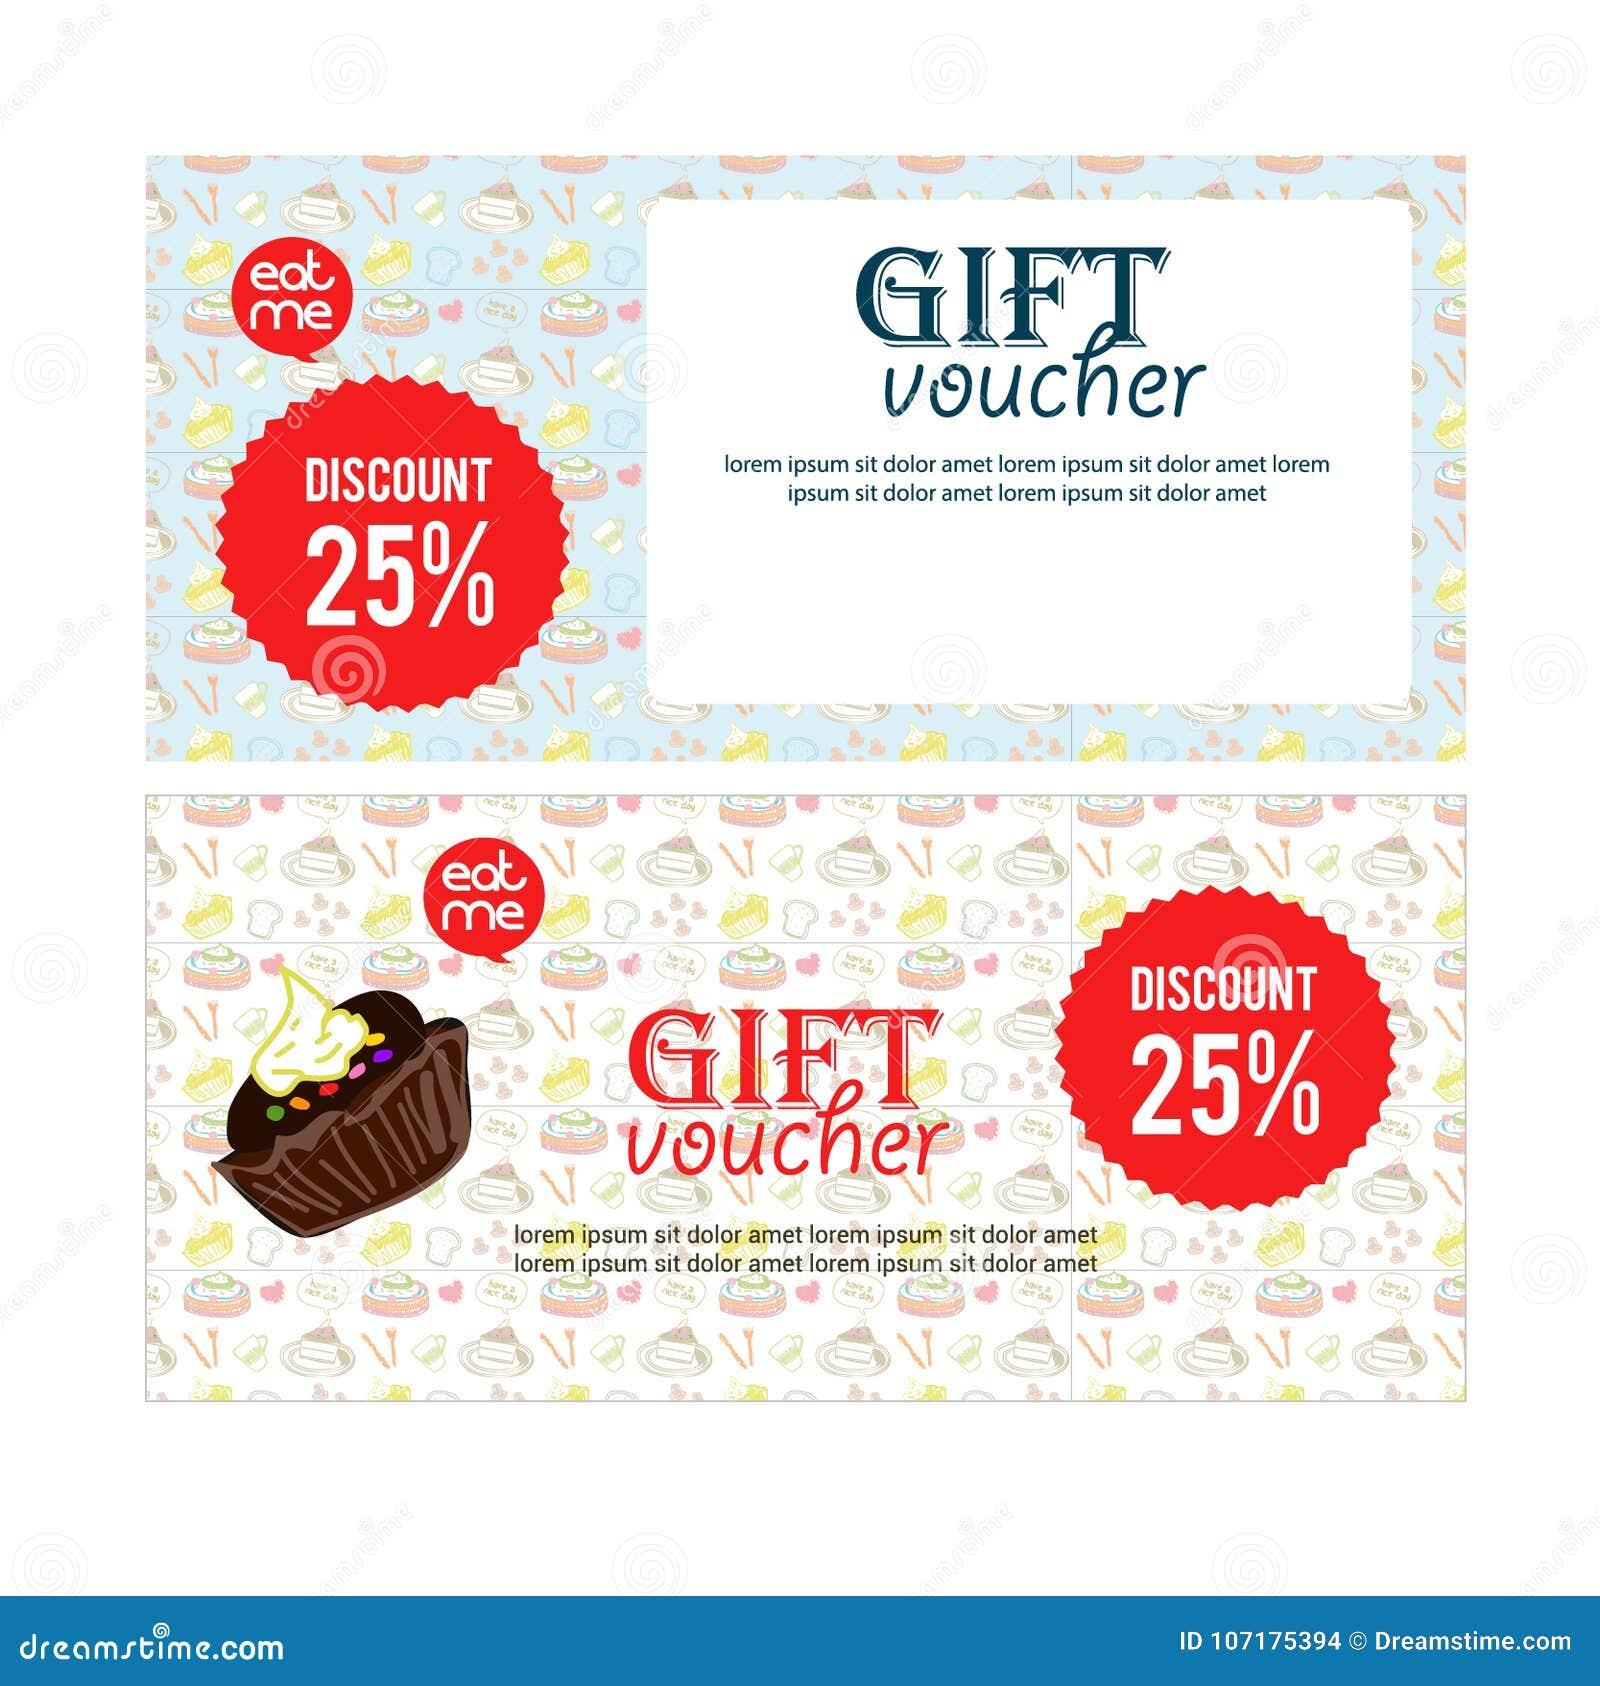 voucher gift banner illustration for restaurant or food website